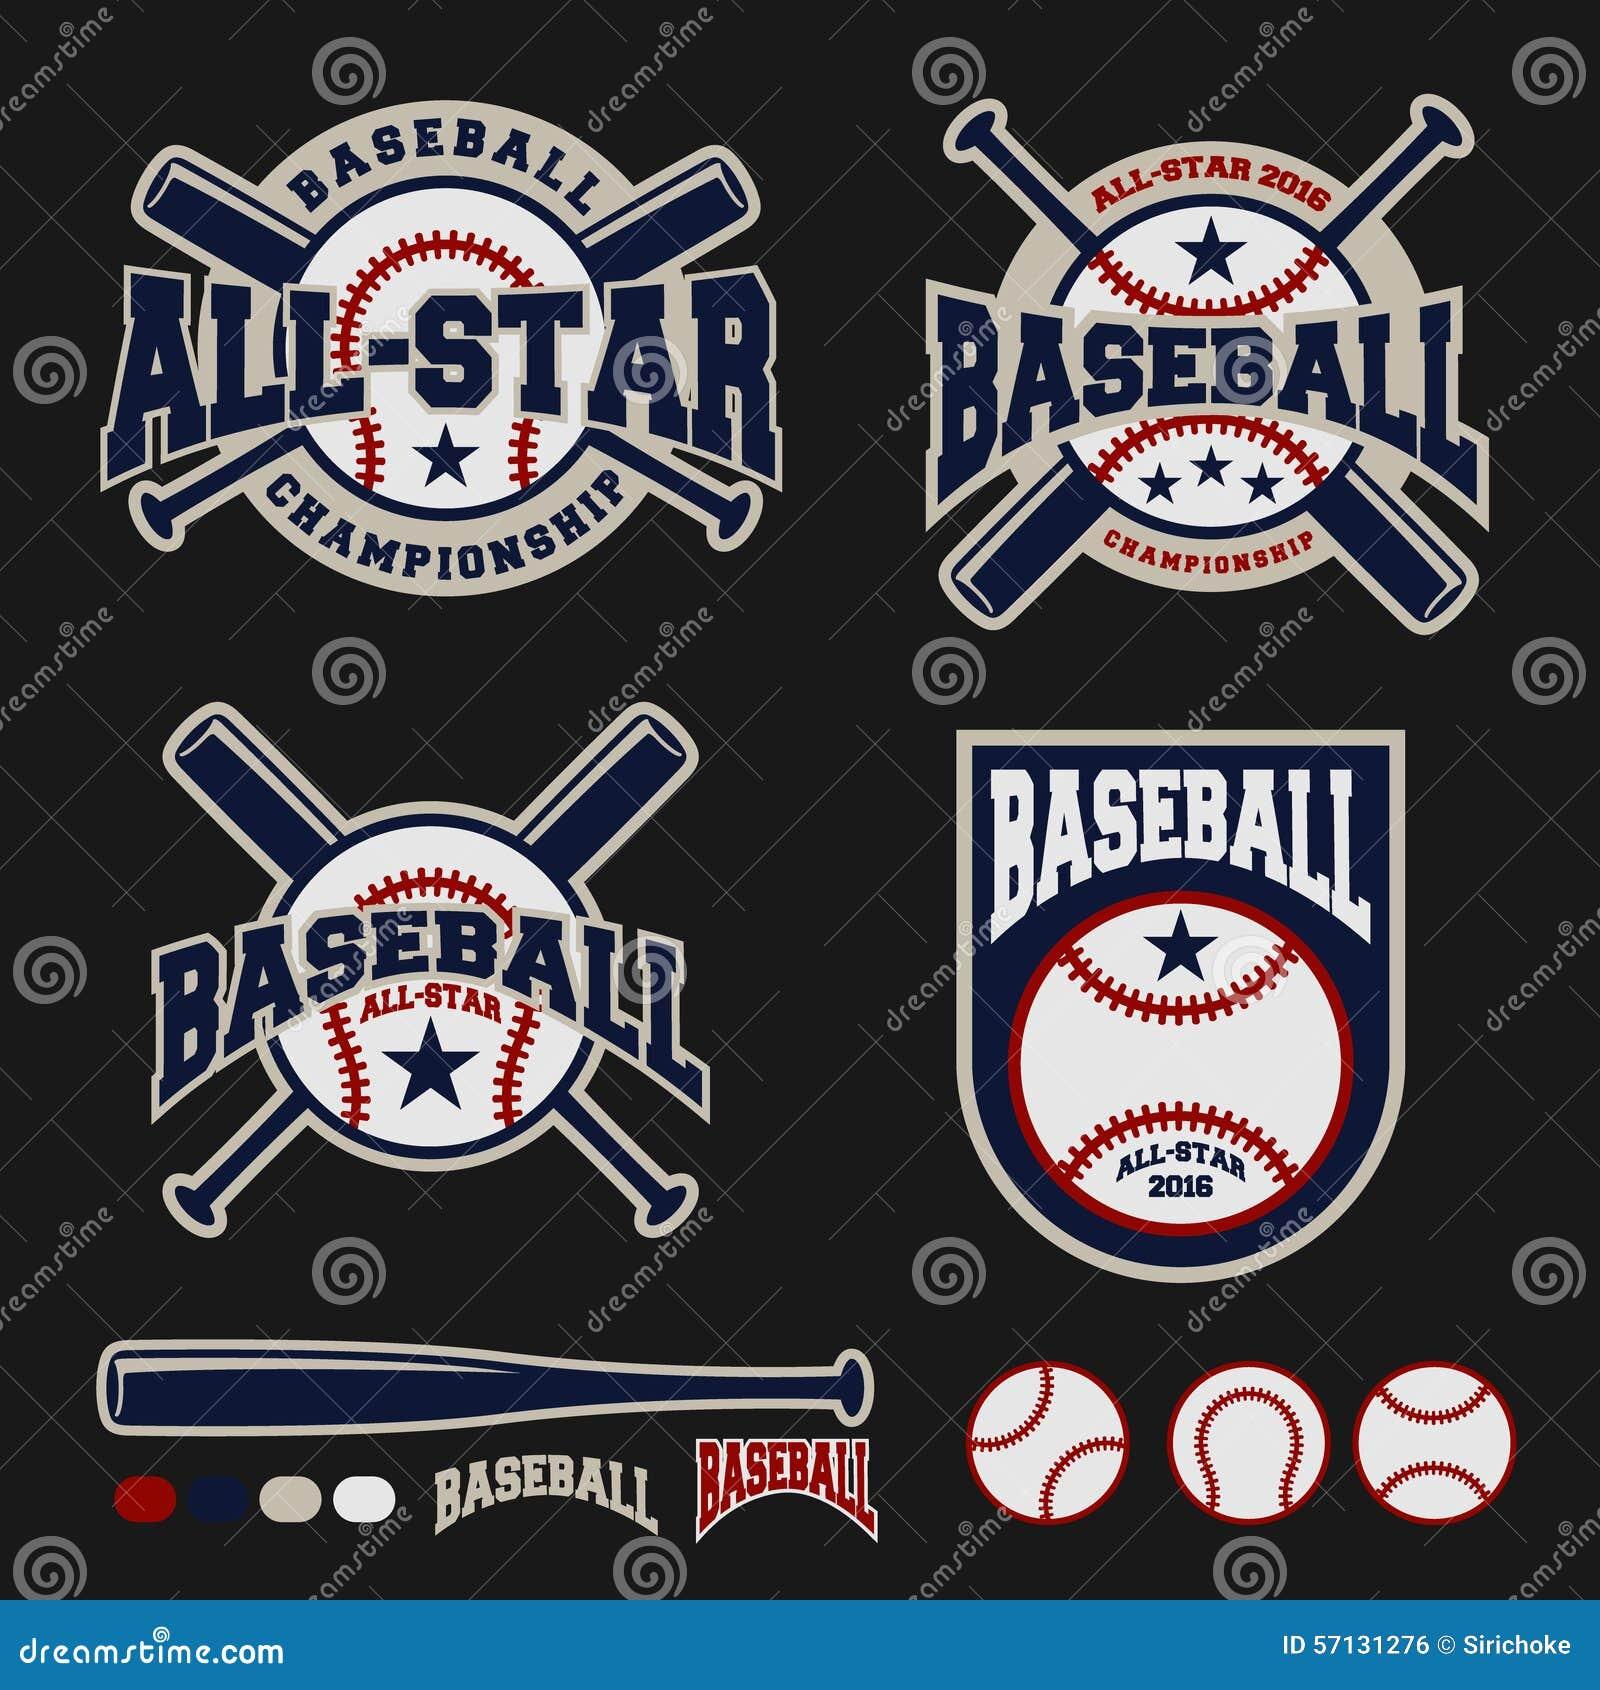 Baseball badge logo design for logos stock vector image for Logos for t shirts printing